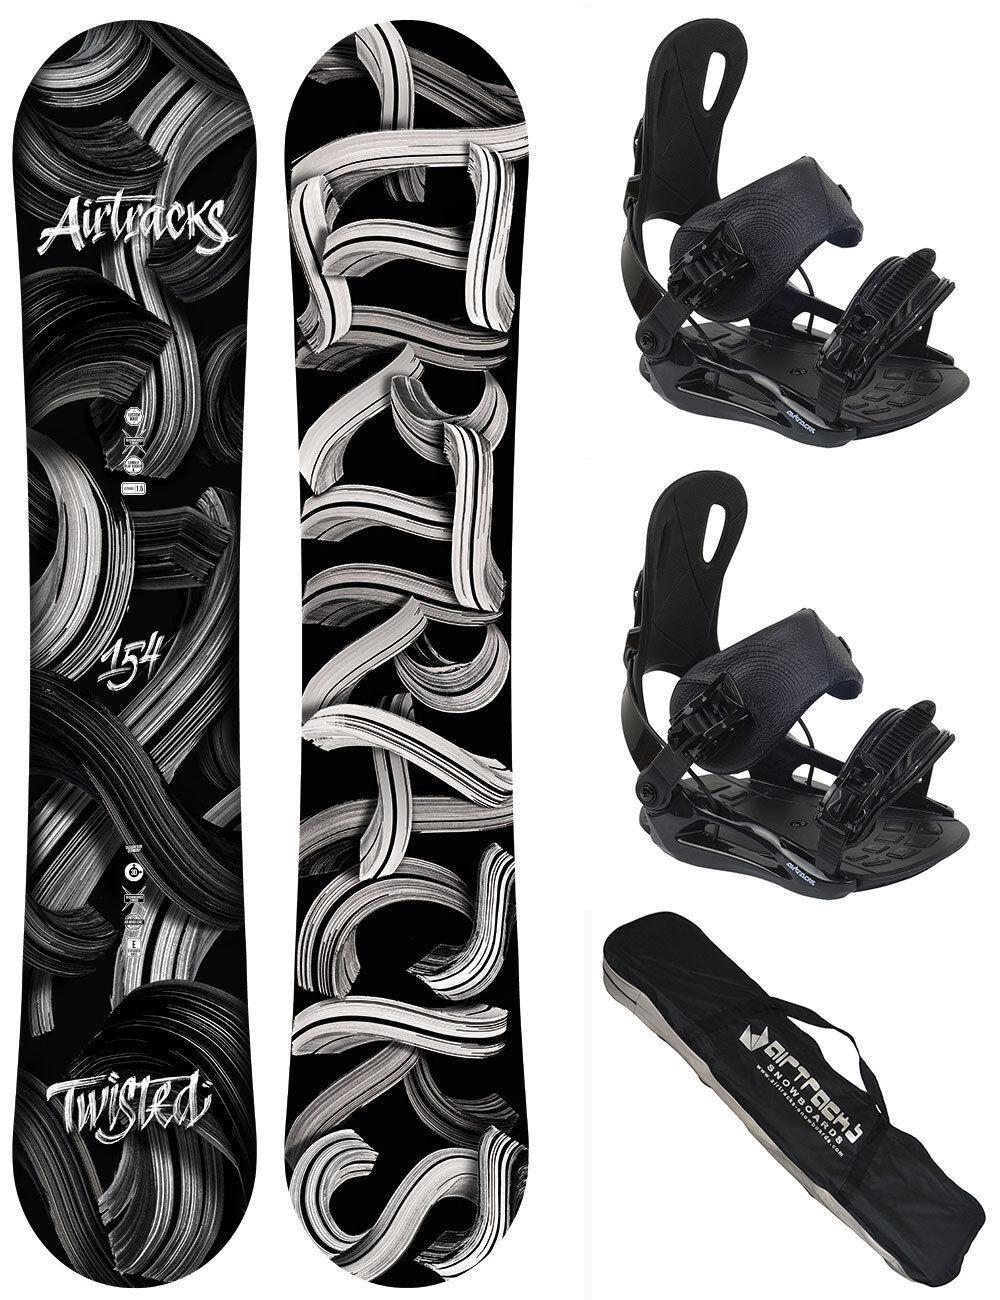 Snowboard Set AIRTRACKS Twisted Rocker+Bindung Star oder Master+Bag  150 154 158